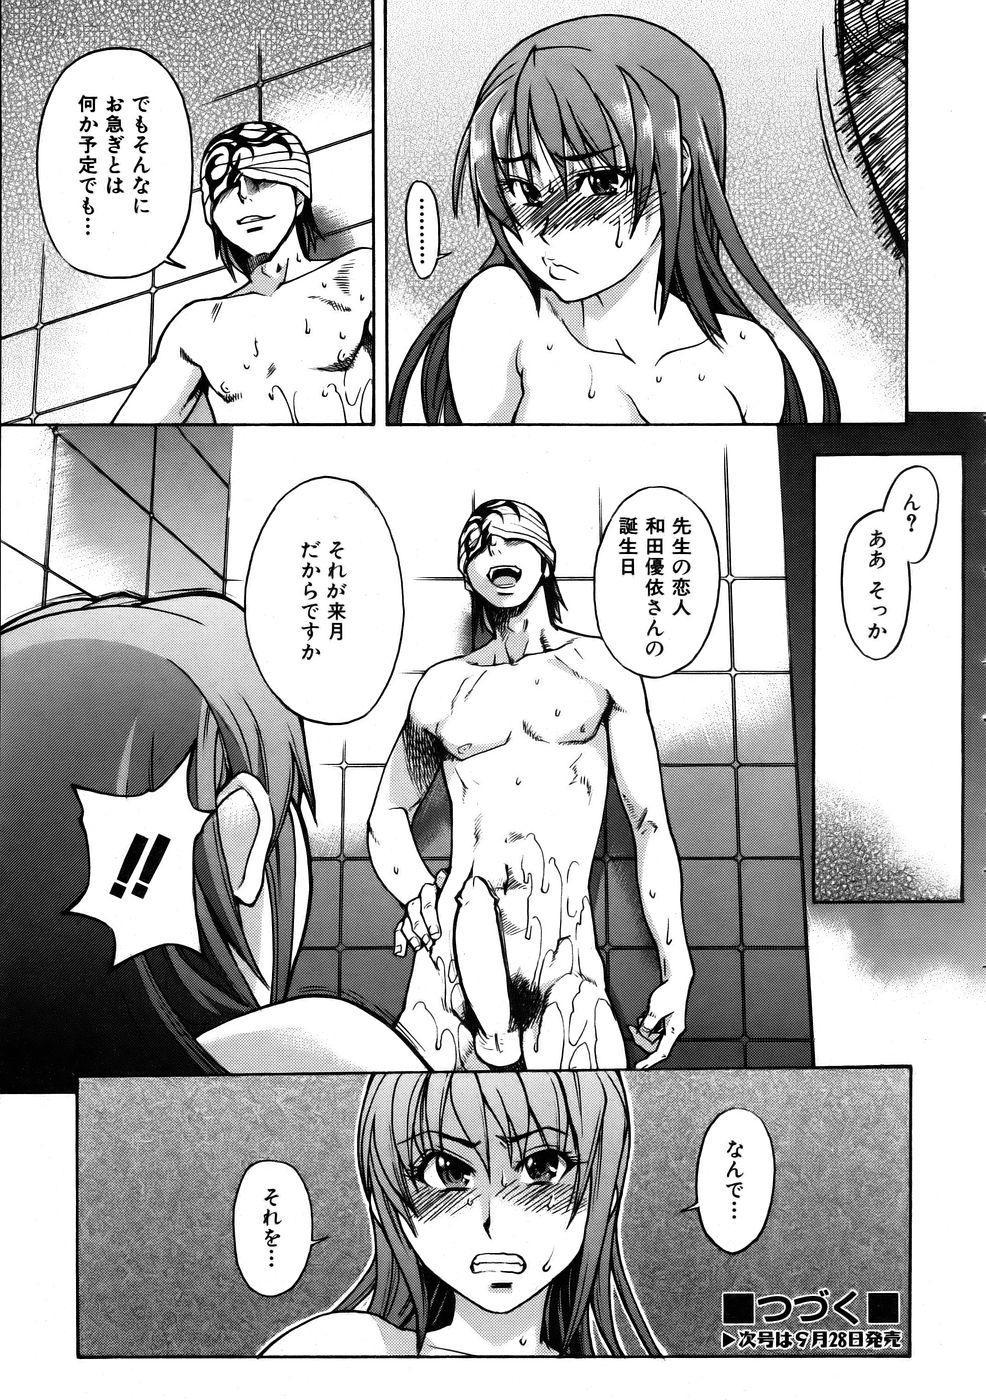 COMIC AUN 2005-10 Vol. 113 46